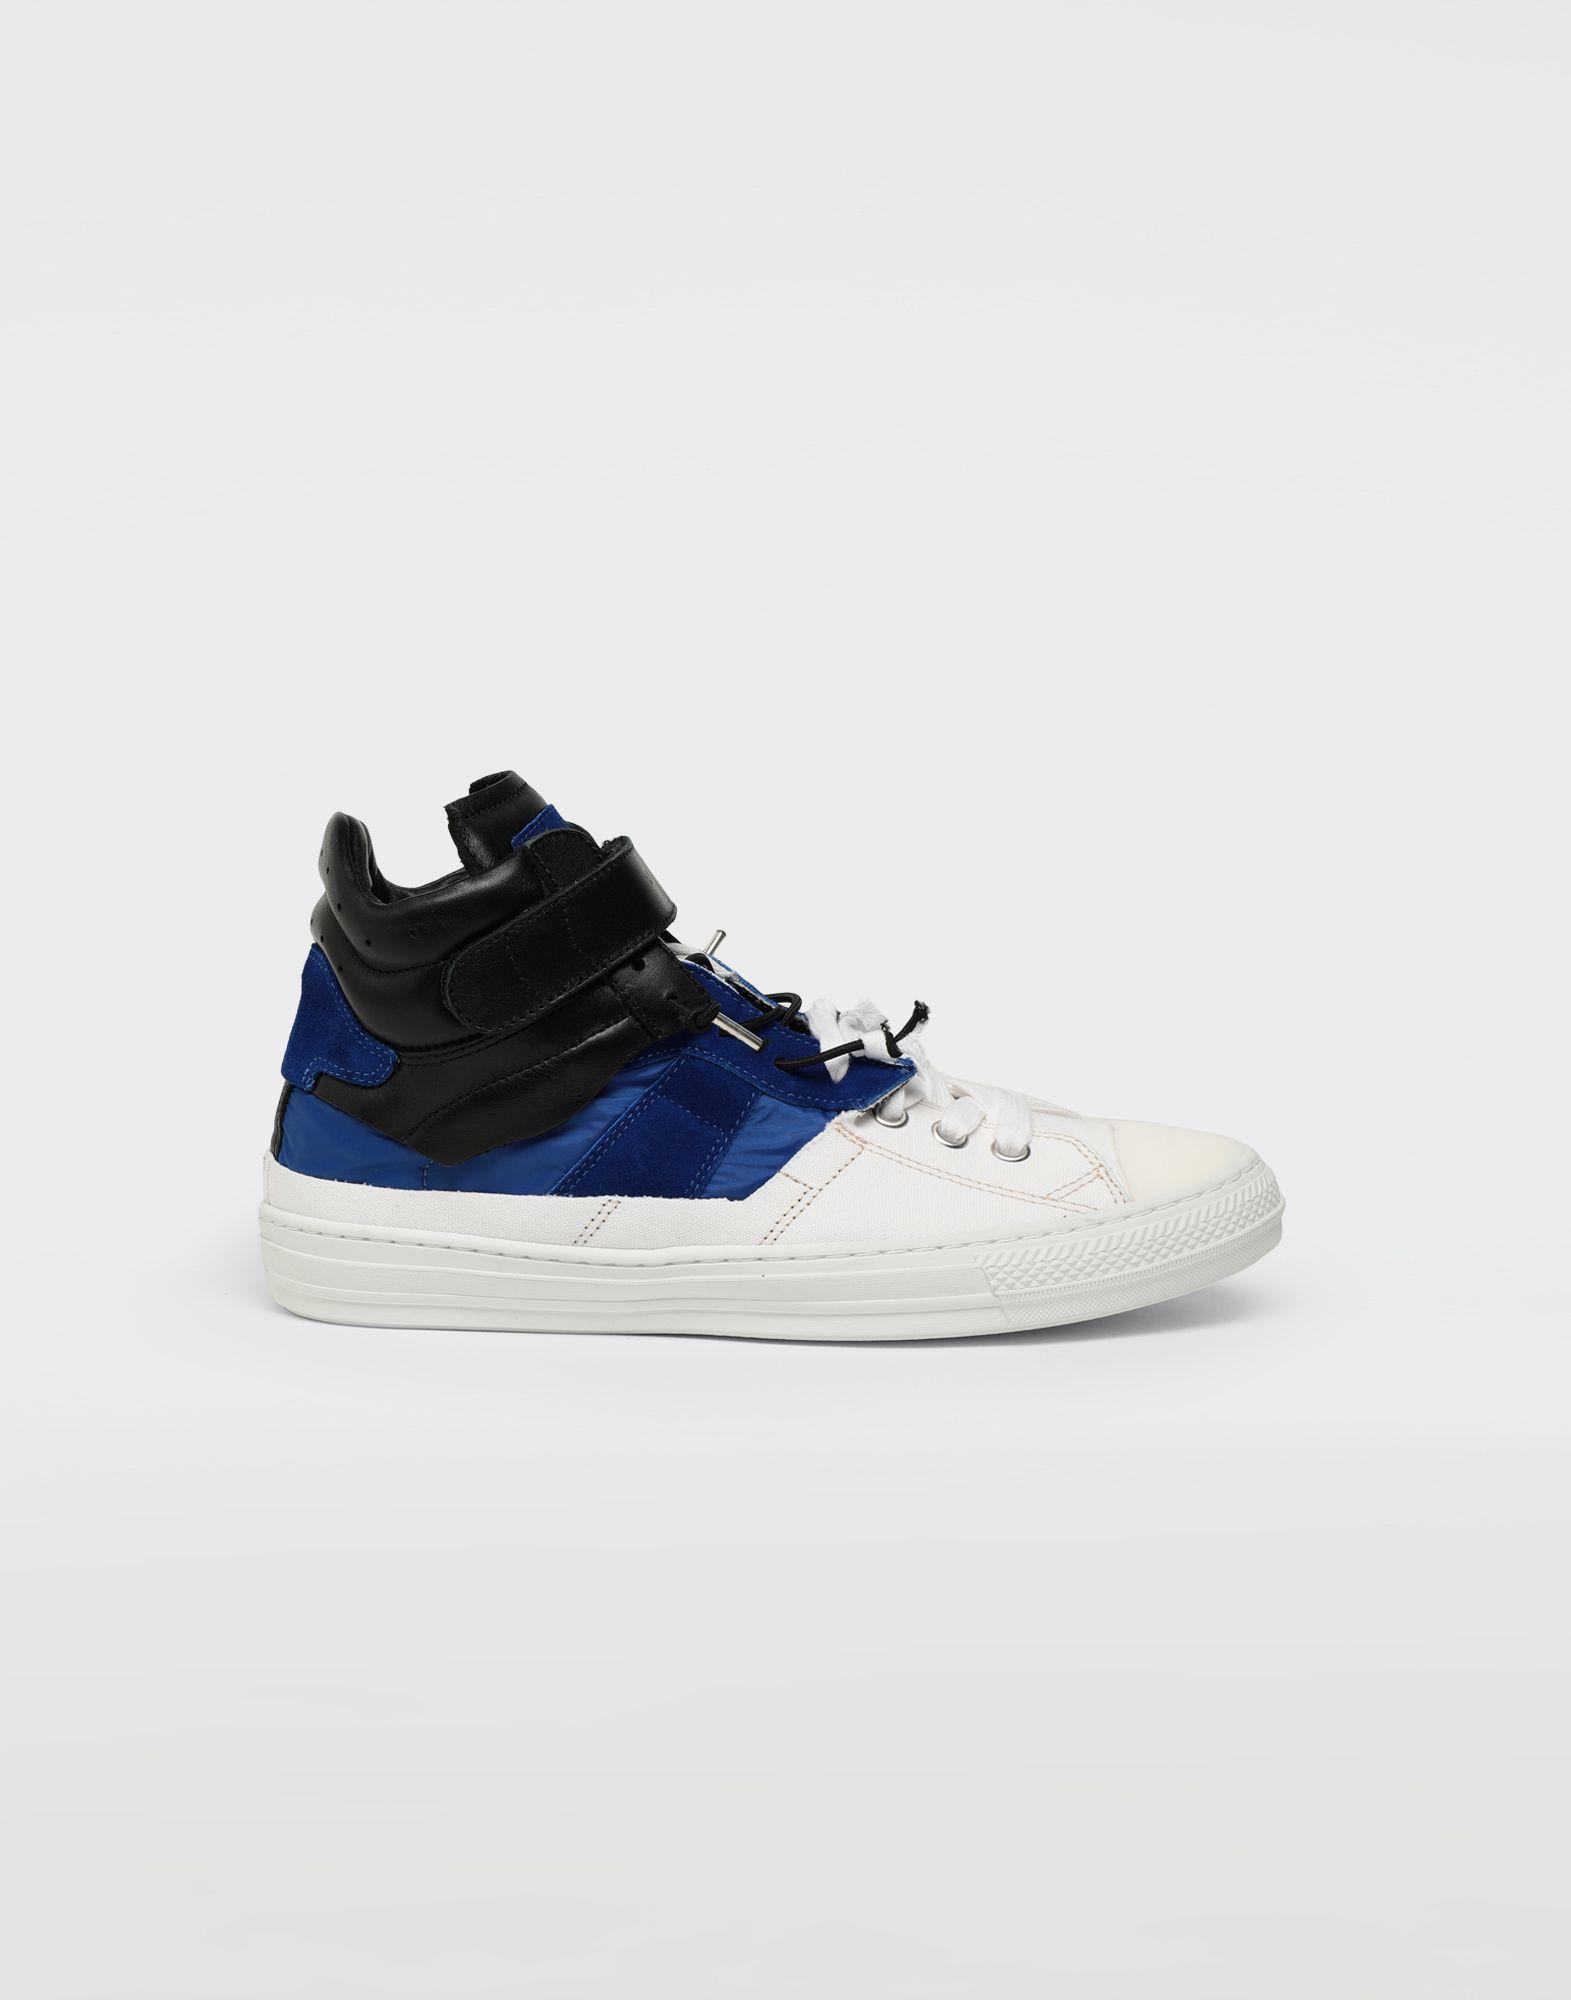 1760d41ea386 Lyst - Maison Margiela Spliced High Top Sneakers in White for Men